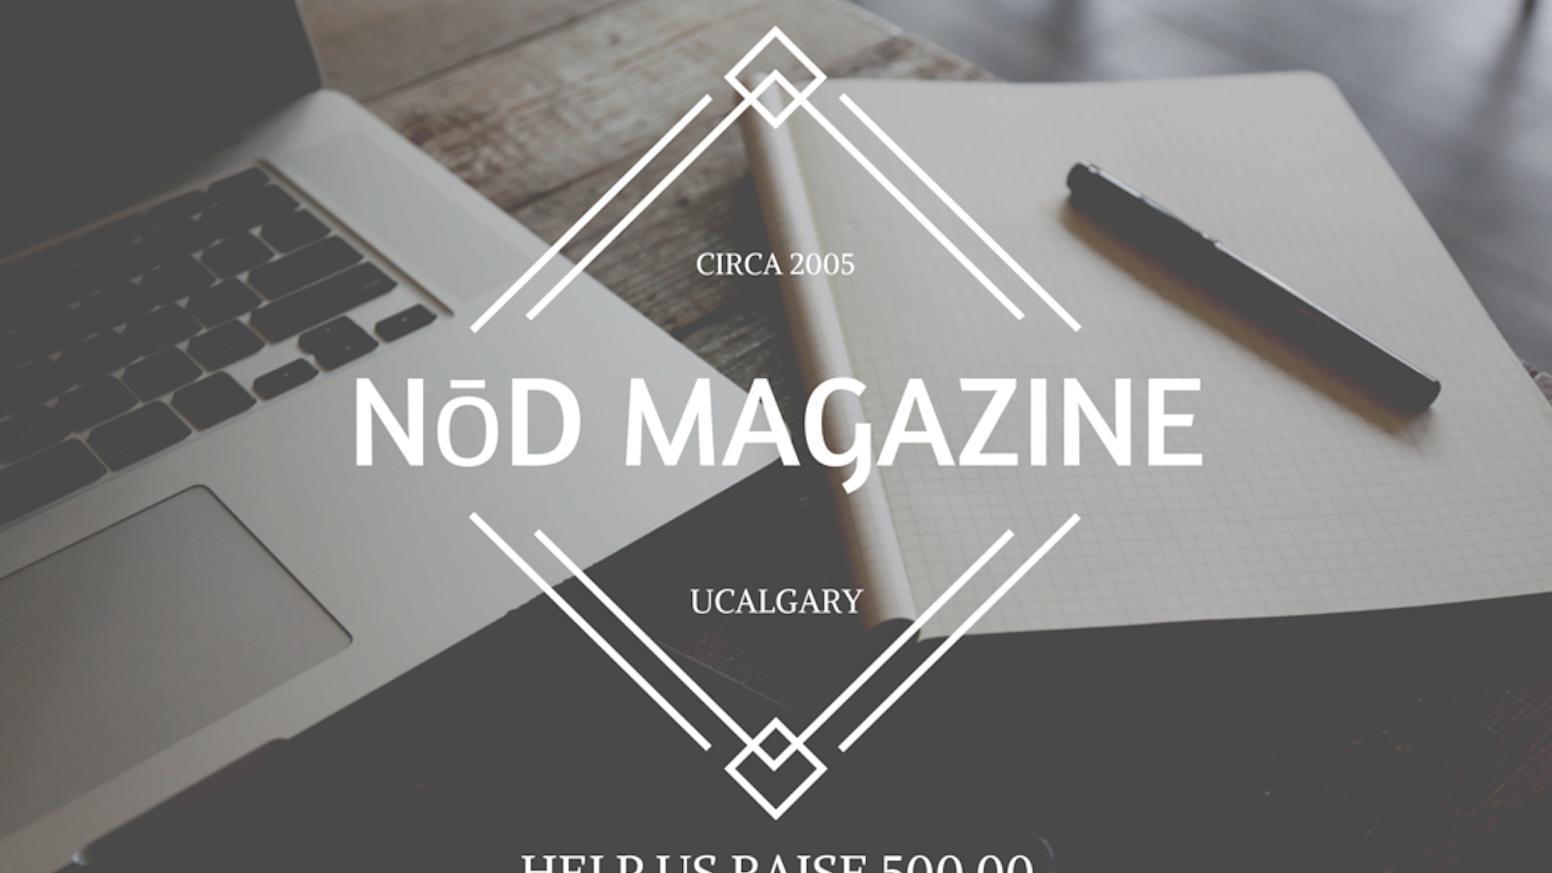 Art Ucalgary Calendar : Nōd magazine by katie o brien —kickstarter